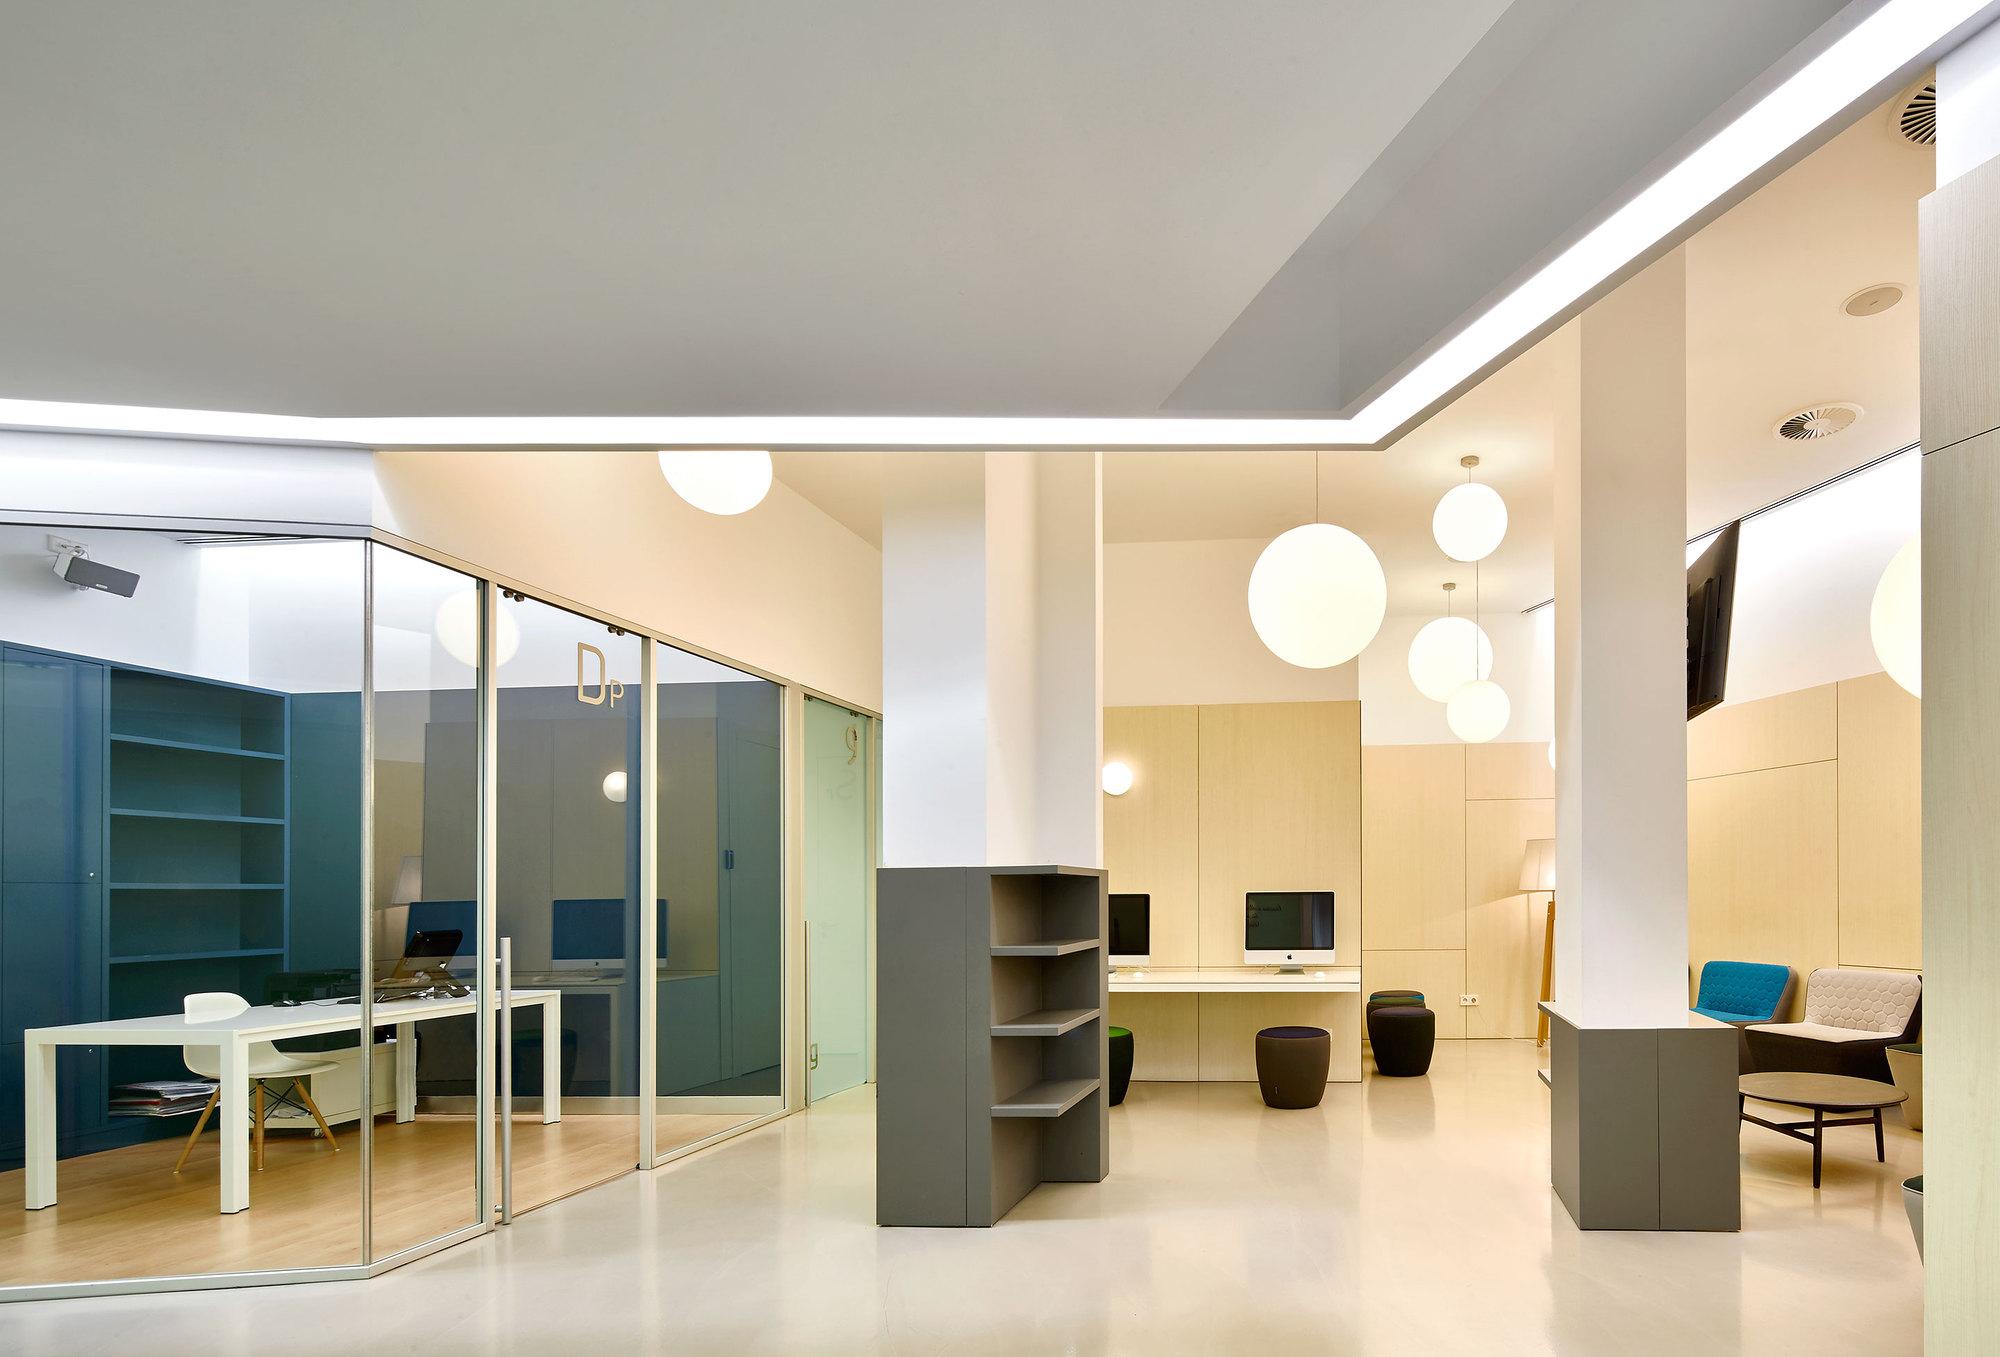 Galer a de ioc cl nica dental en vecindario padilla for Design 4 office lausanne